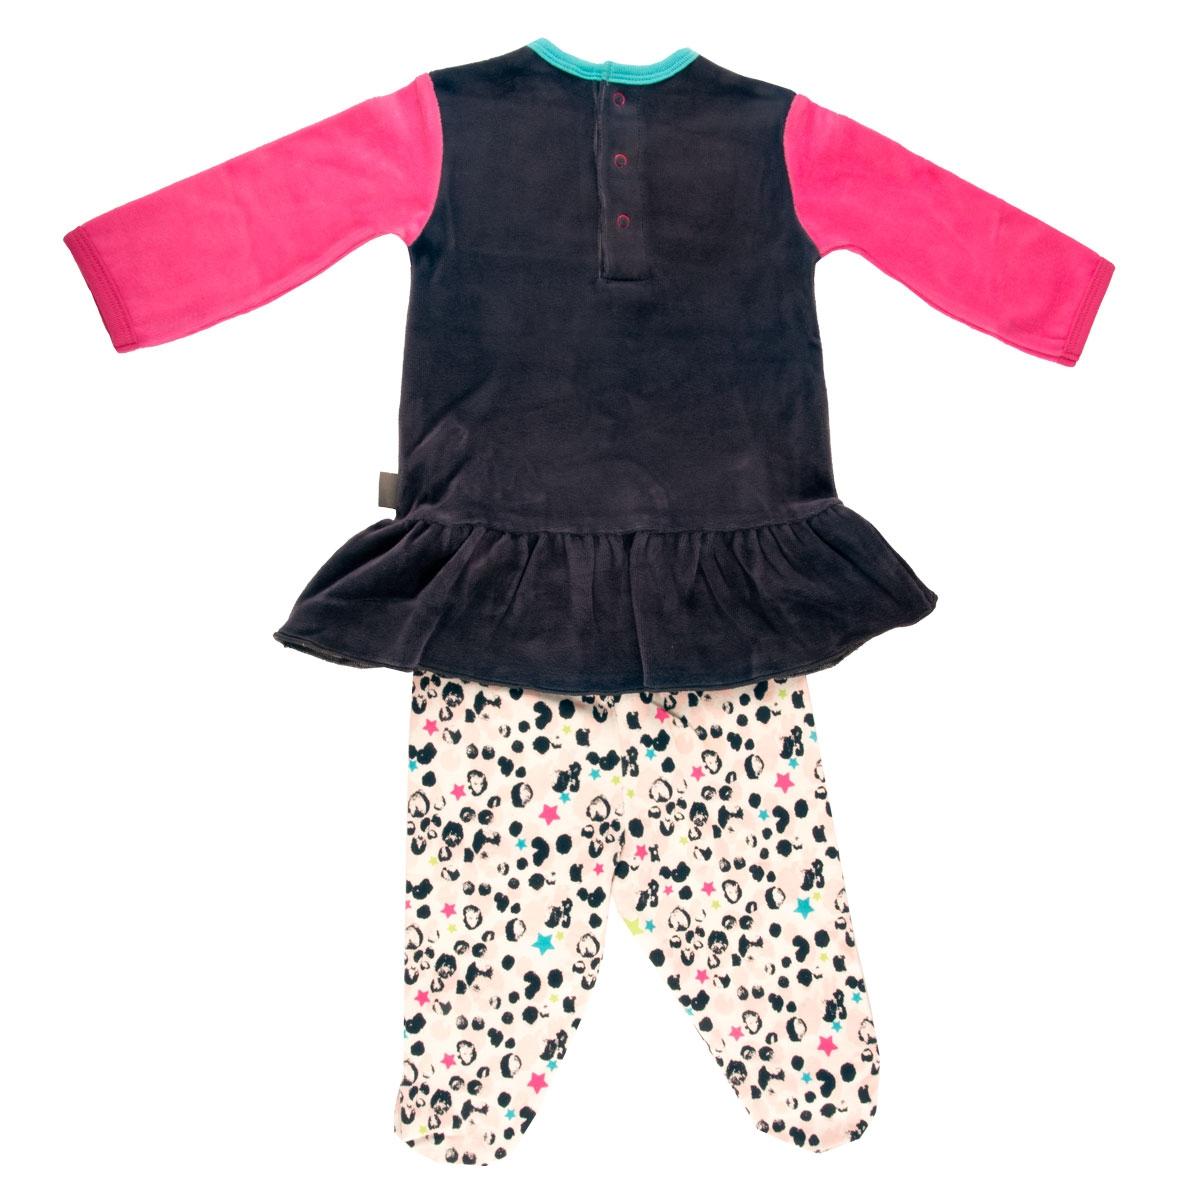 ee6a03d313aab Pyjama bébé 2 pièces avec pieds Wish - PETIT BEGUIN